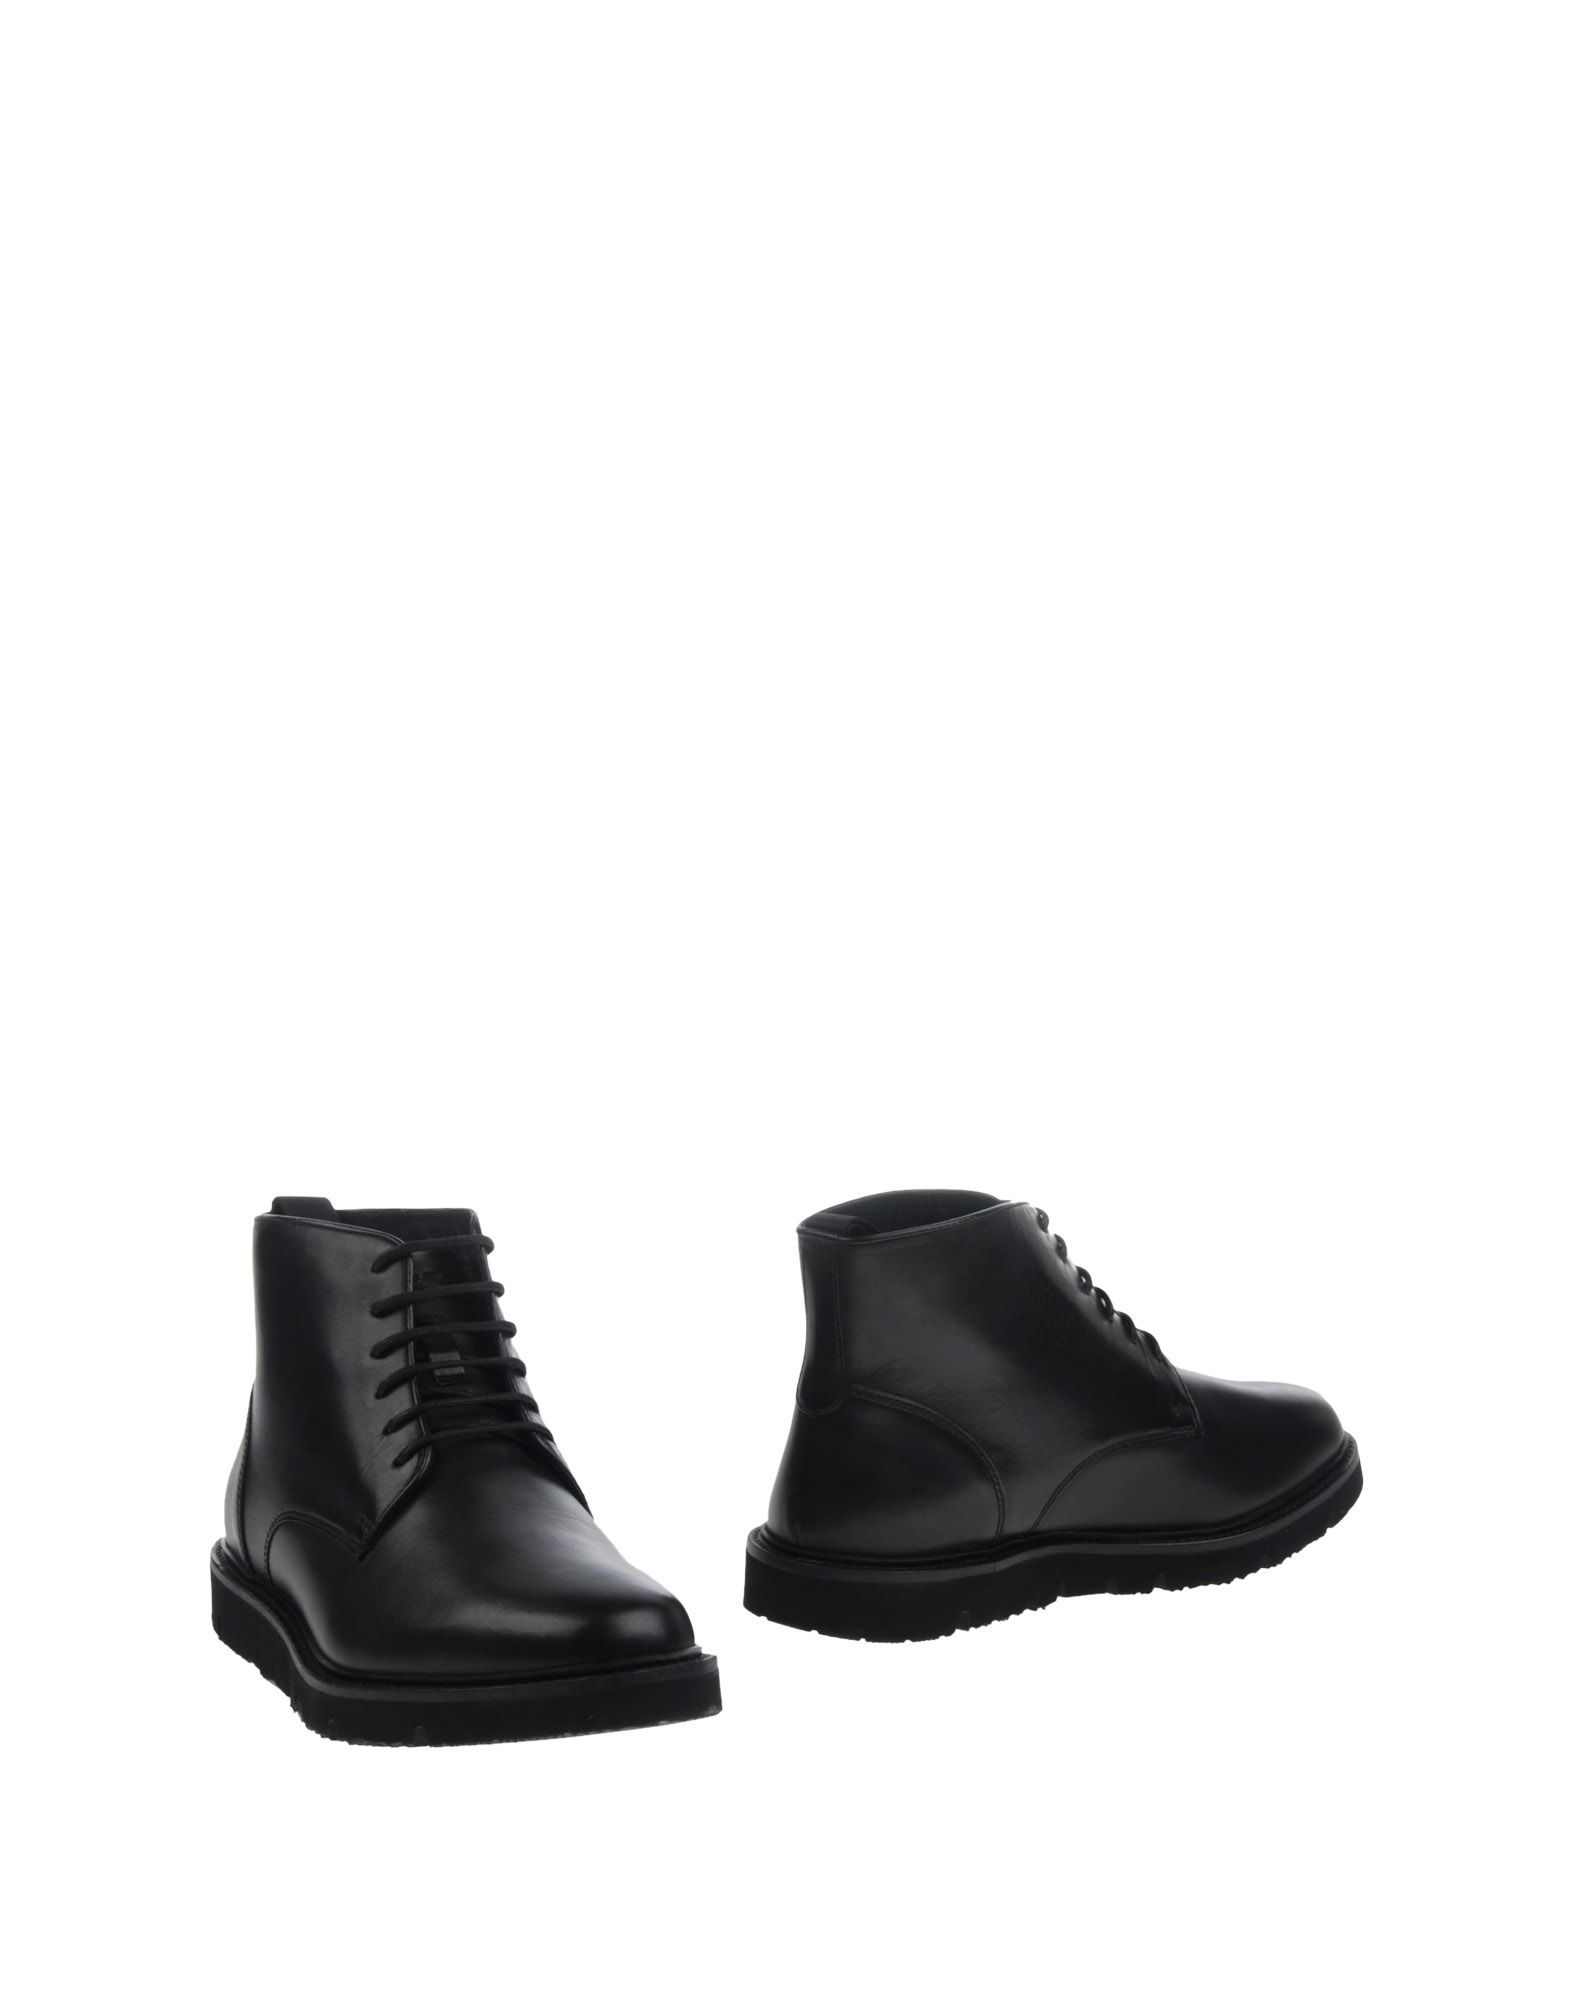 Armani Jeans Jeans Armani Stiefelette Herren  11270507RL 61ef4c